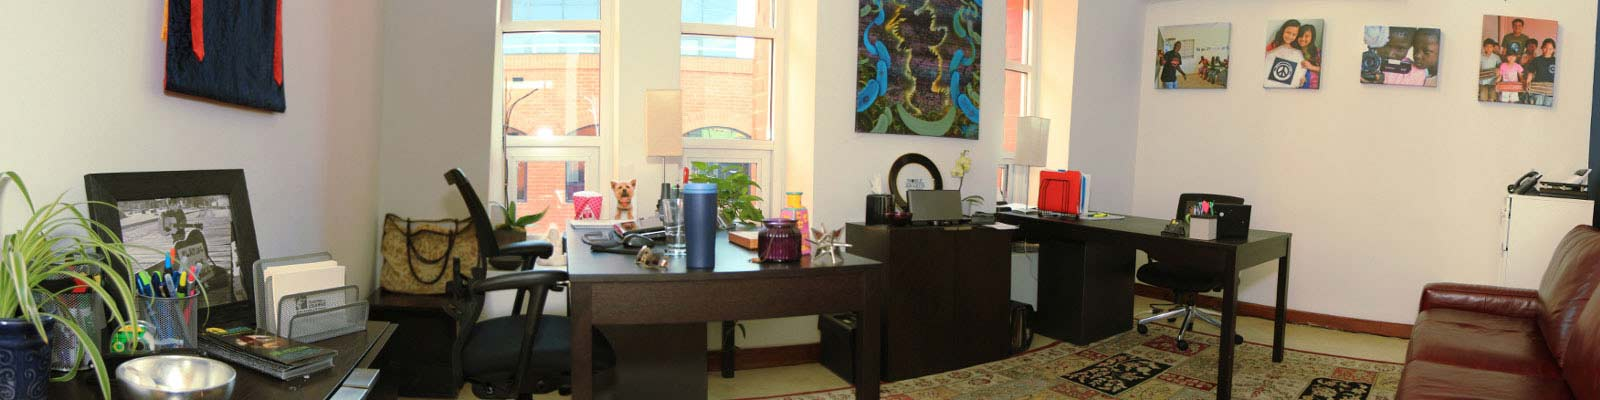 Temporary Santa Monica Office - Meeting Room